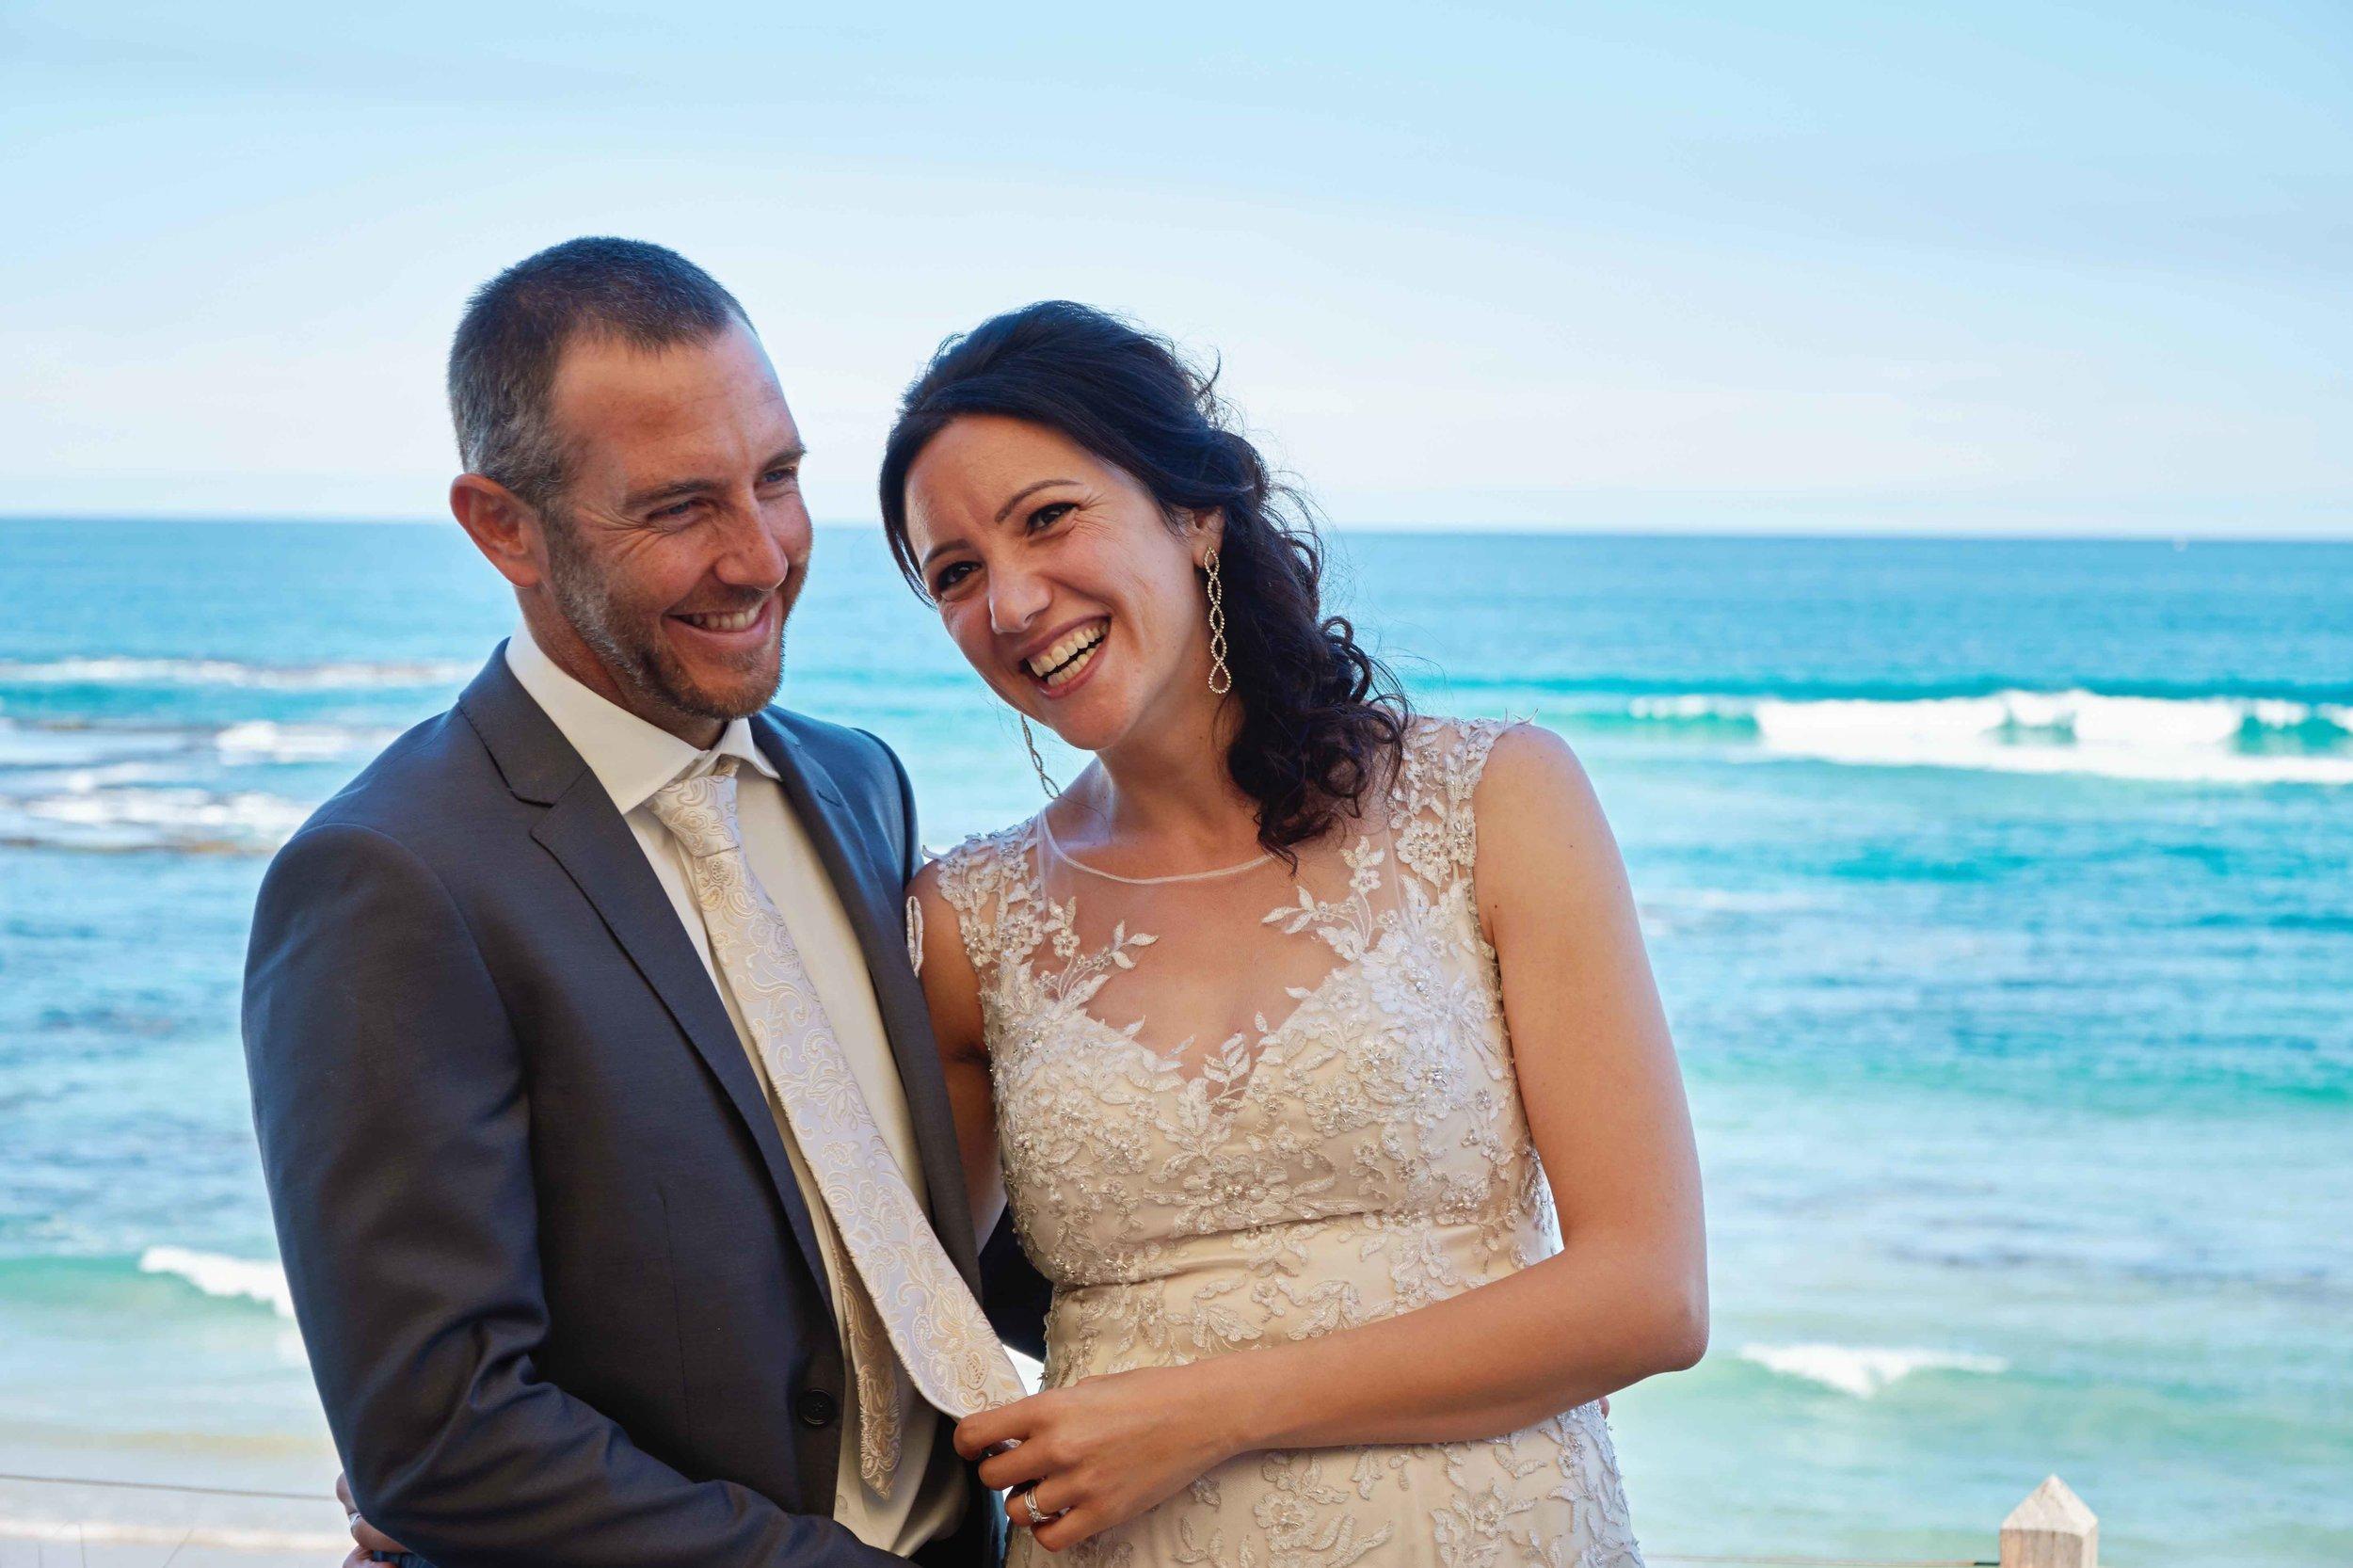 sorrento-wedding-photography-all-smiles-marissa-jade-photography-69.jpg